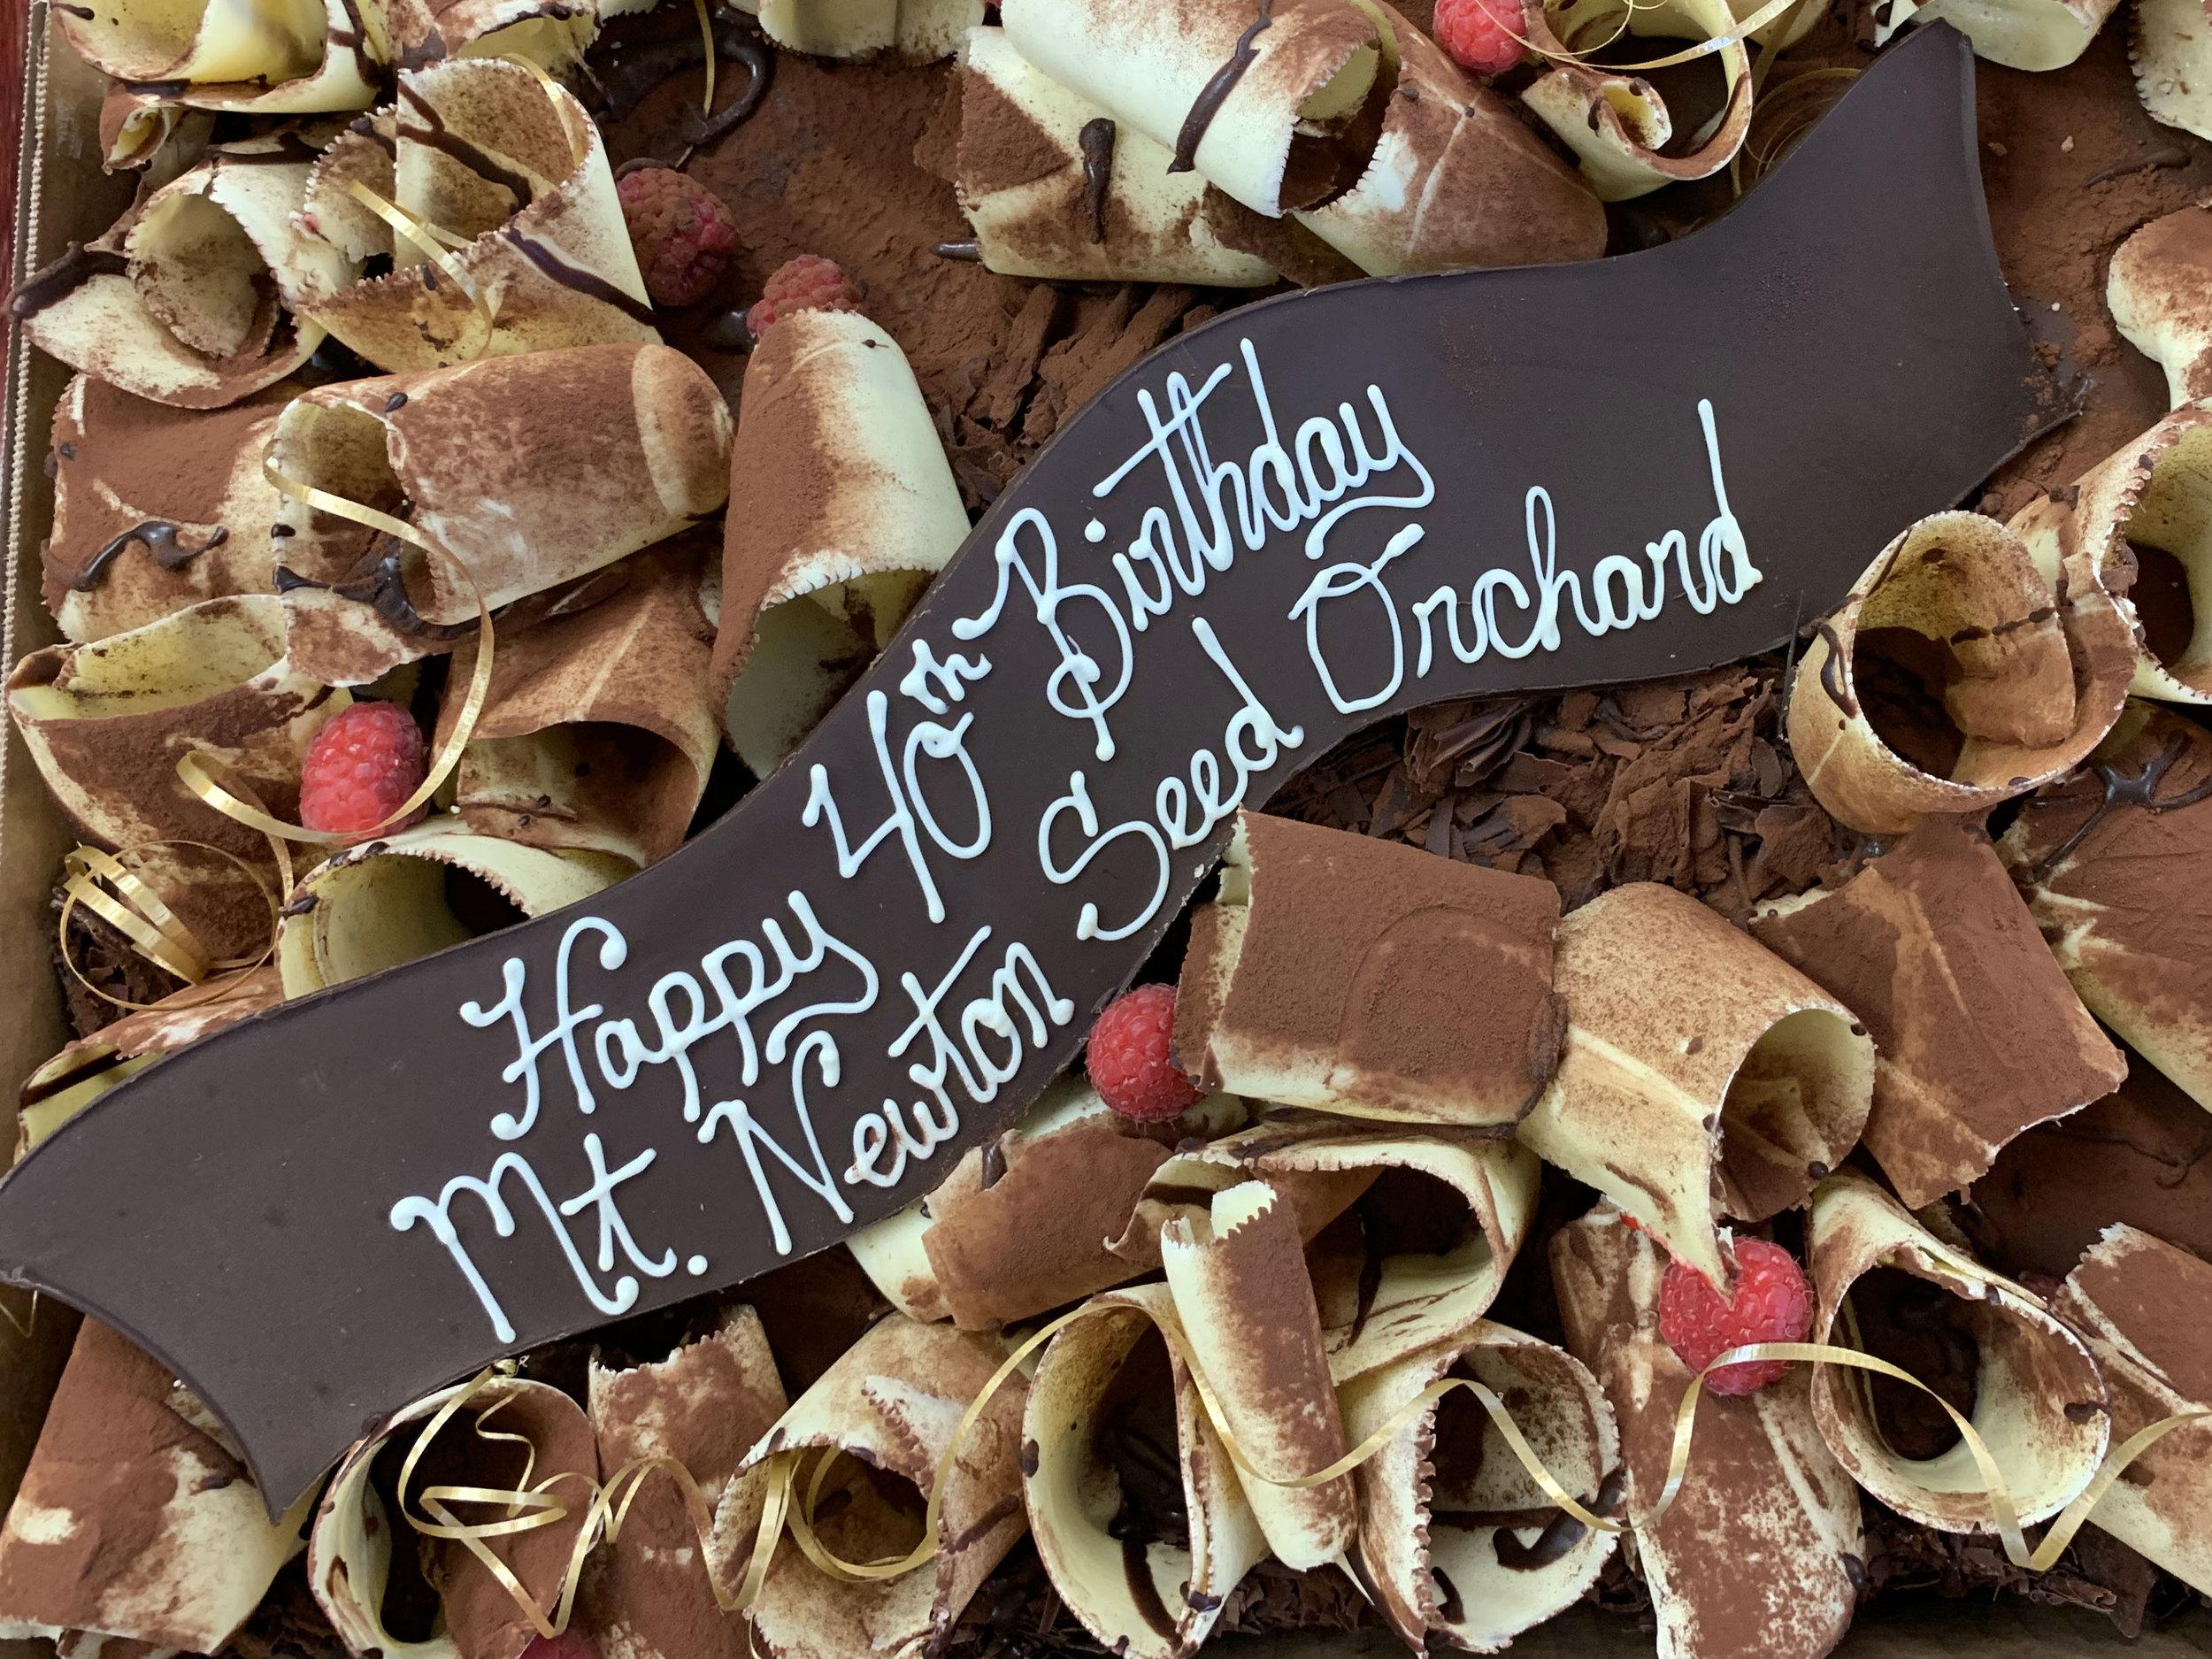 Mt Newton 40th birthday cake.jpg